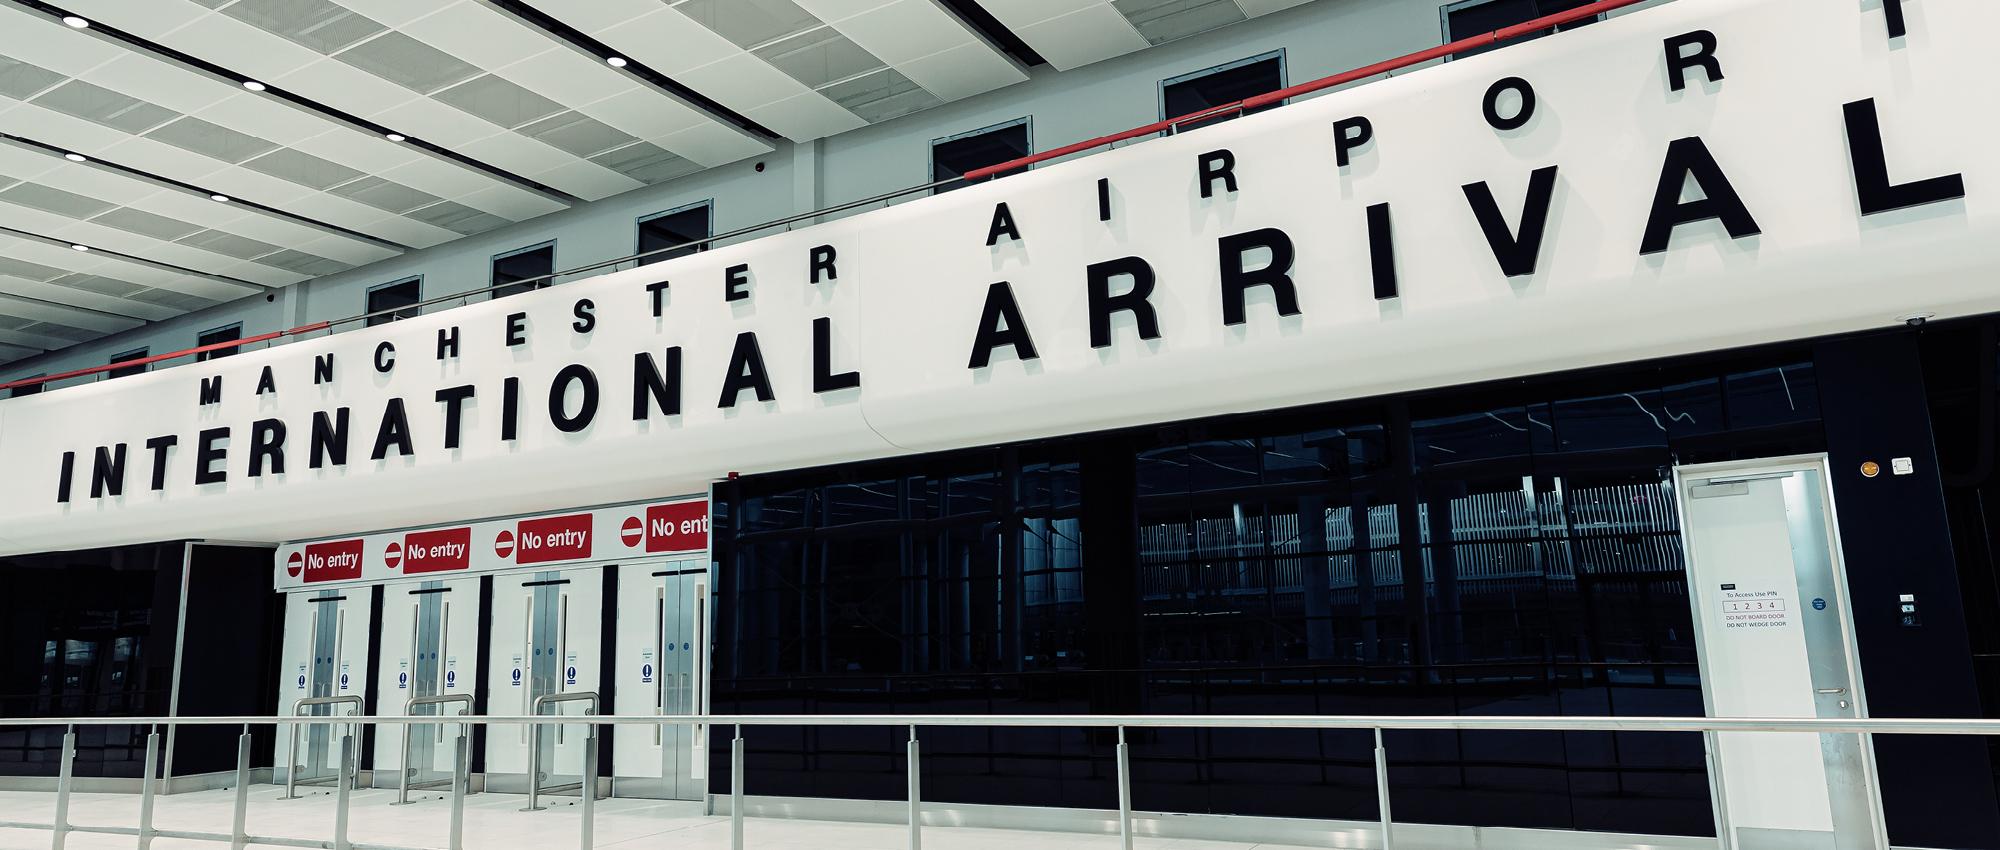 manchester-airport-arrivals